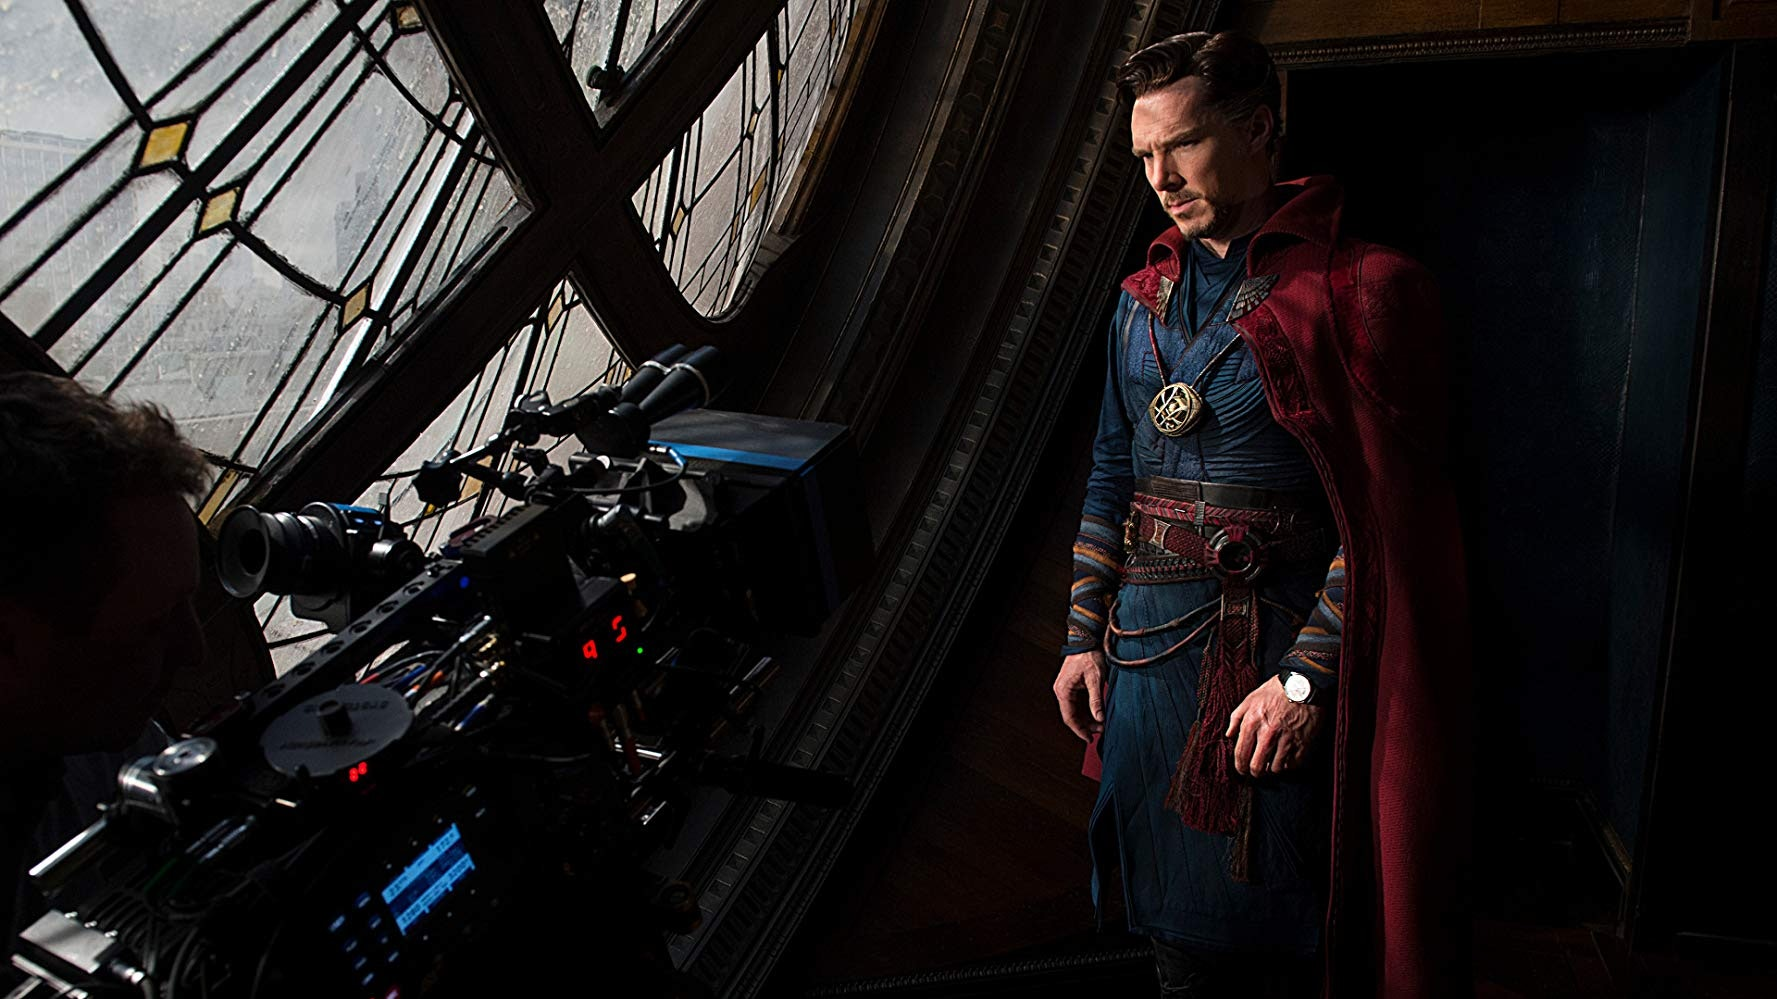 Benedict Cumberbatch in costume as Doctor Strange on the set of 'Doctor Strange'